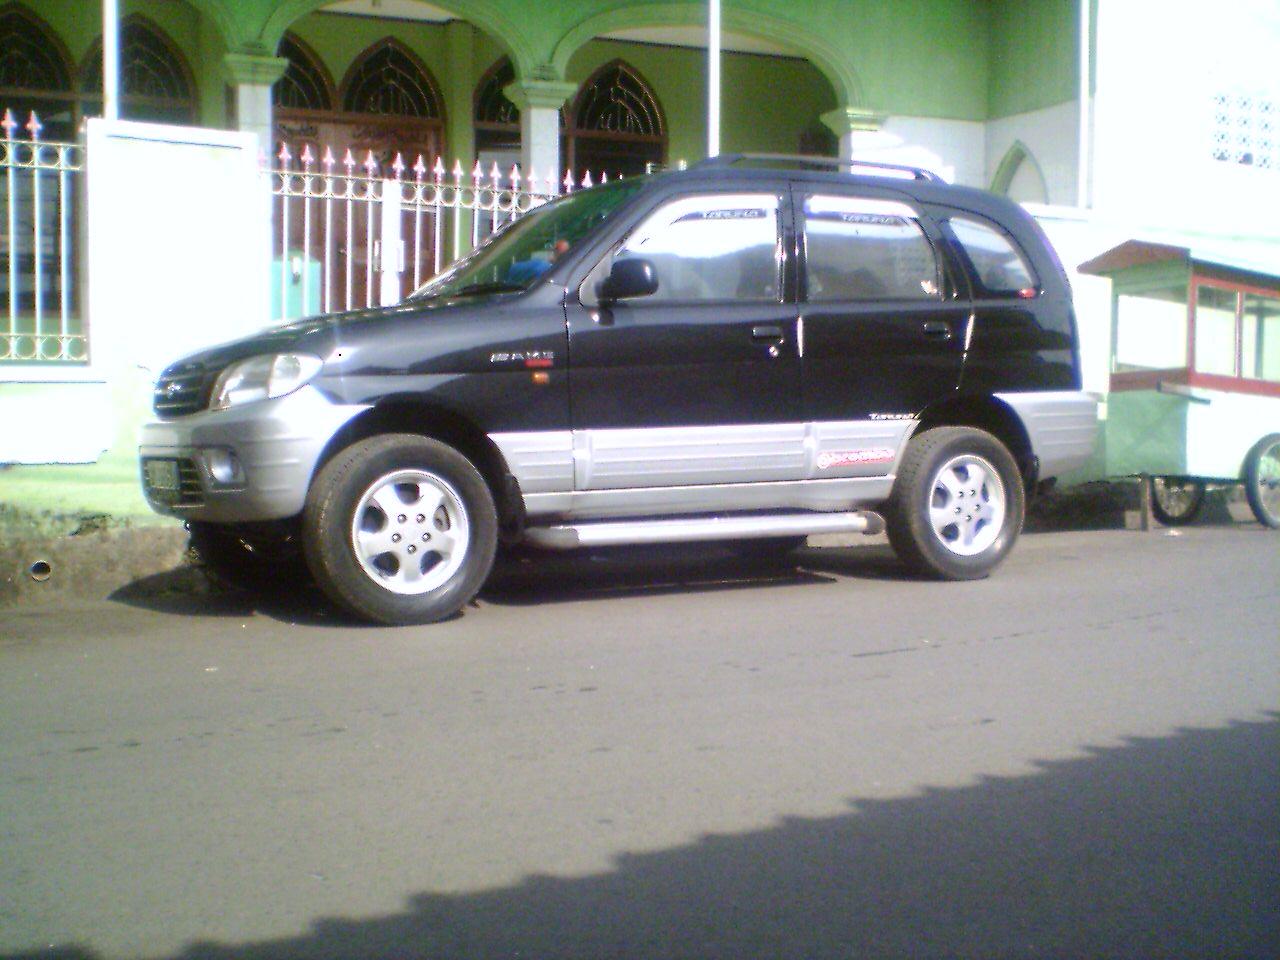 mobil2ndduplikat: Pasang Iklan Mobil Bekas: Dijual Mobil Bekas